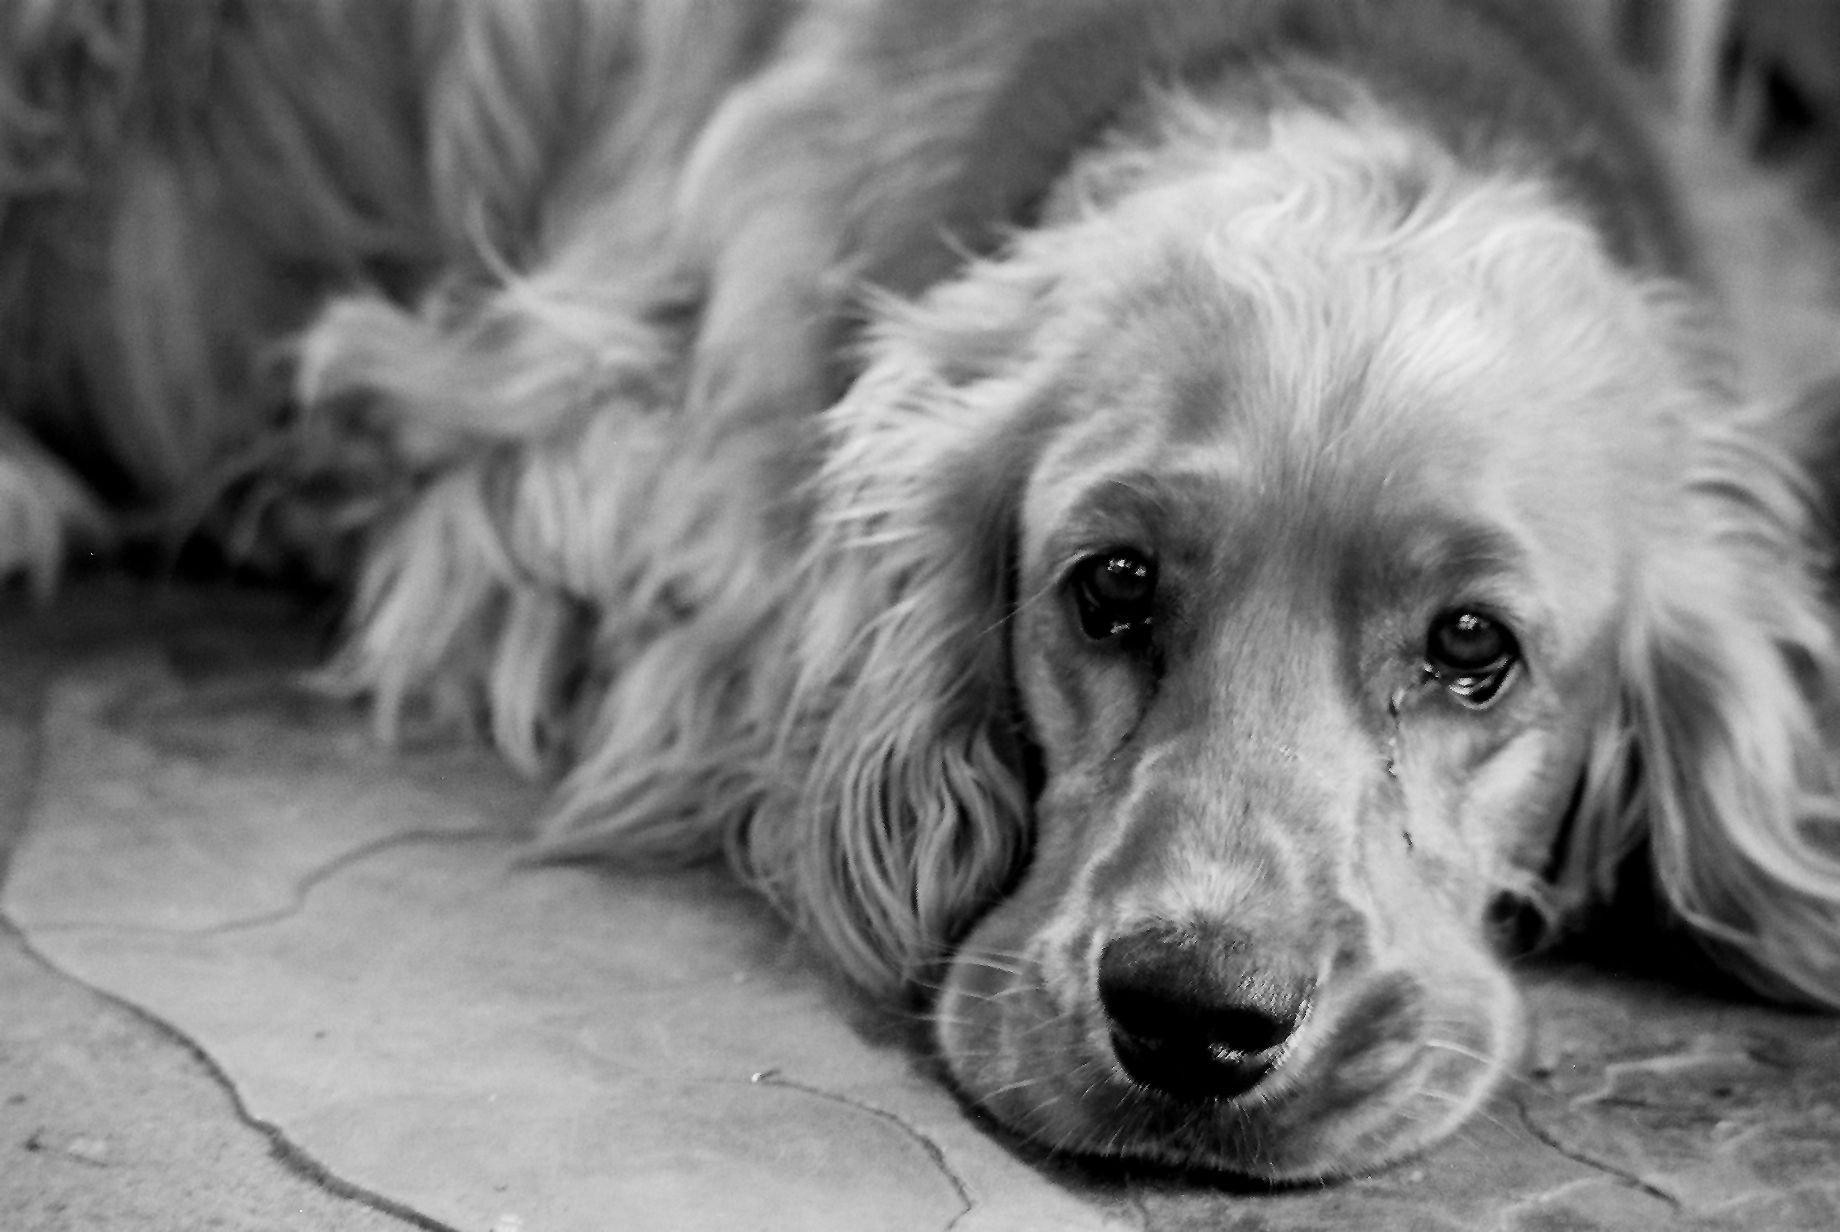 ВПетербурге мужчина зарезал свою собаку наглазах улюдей